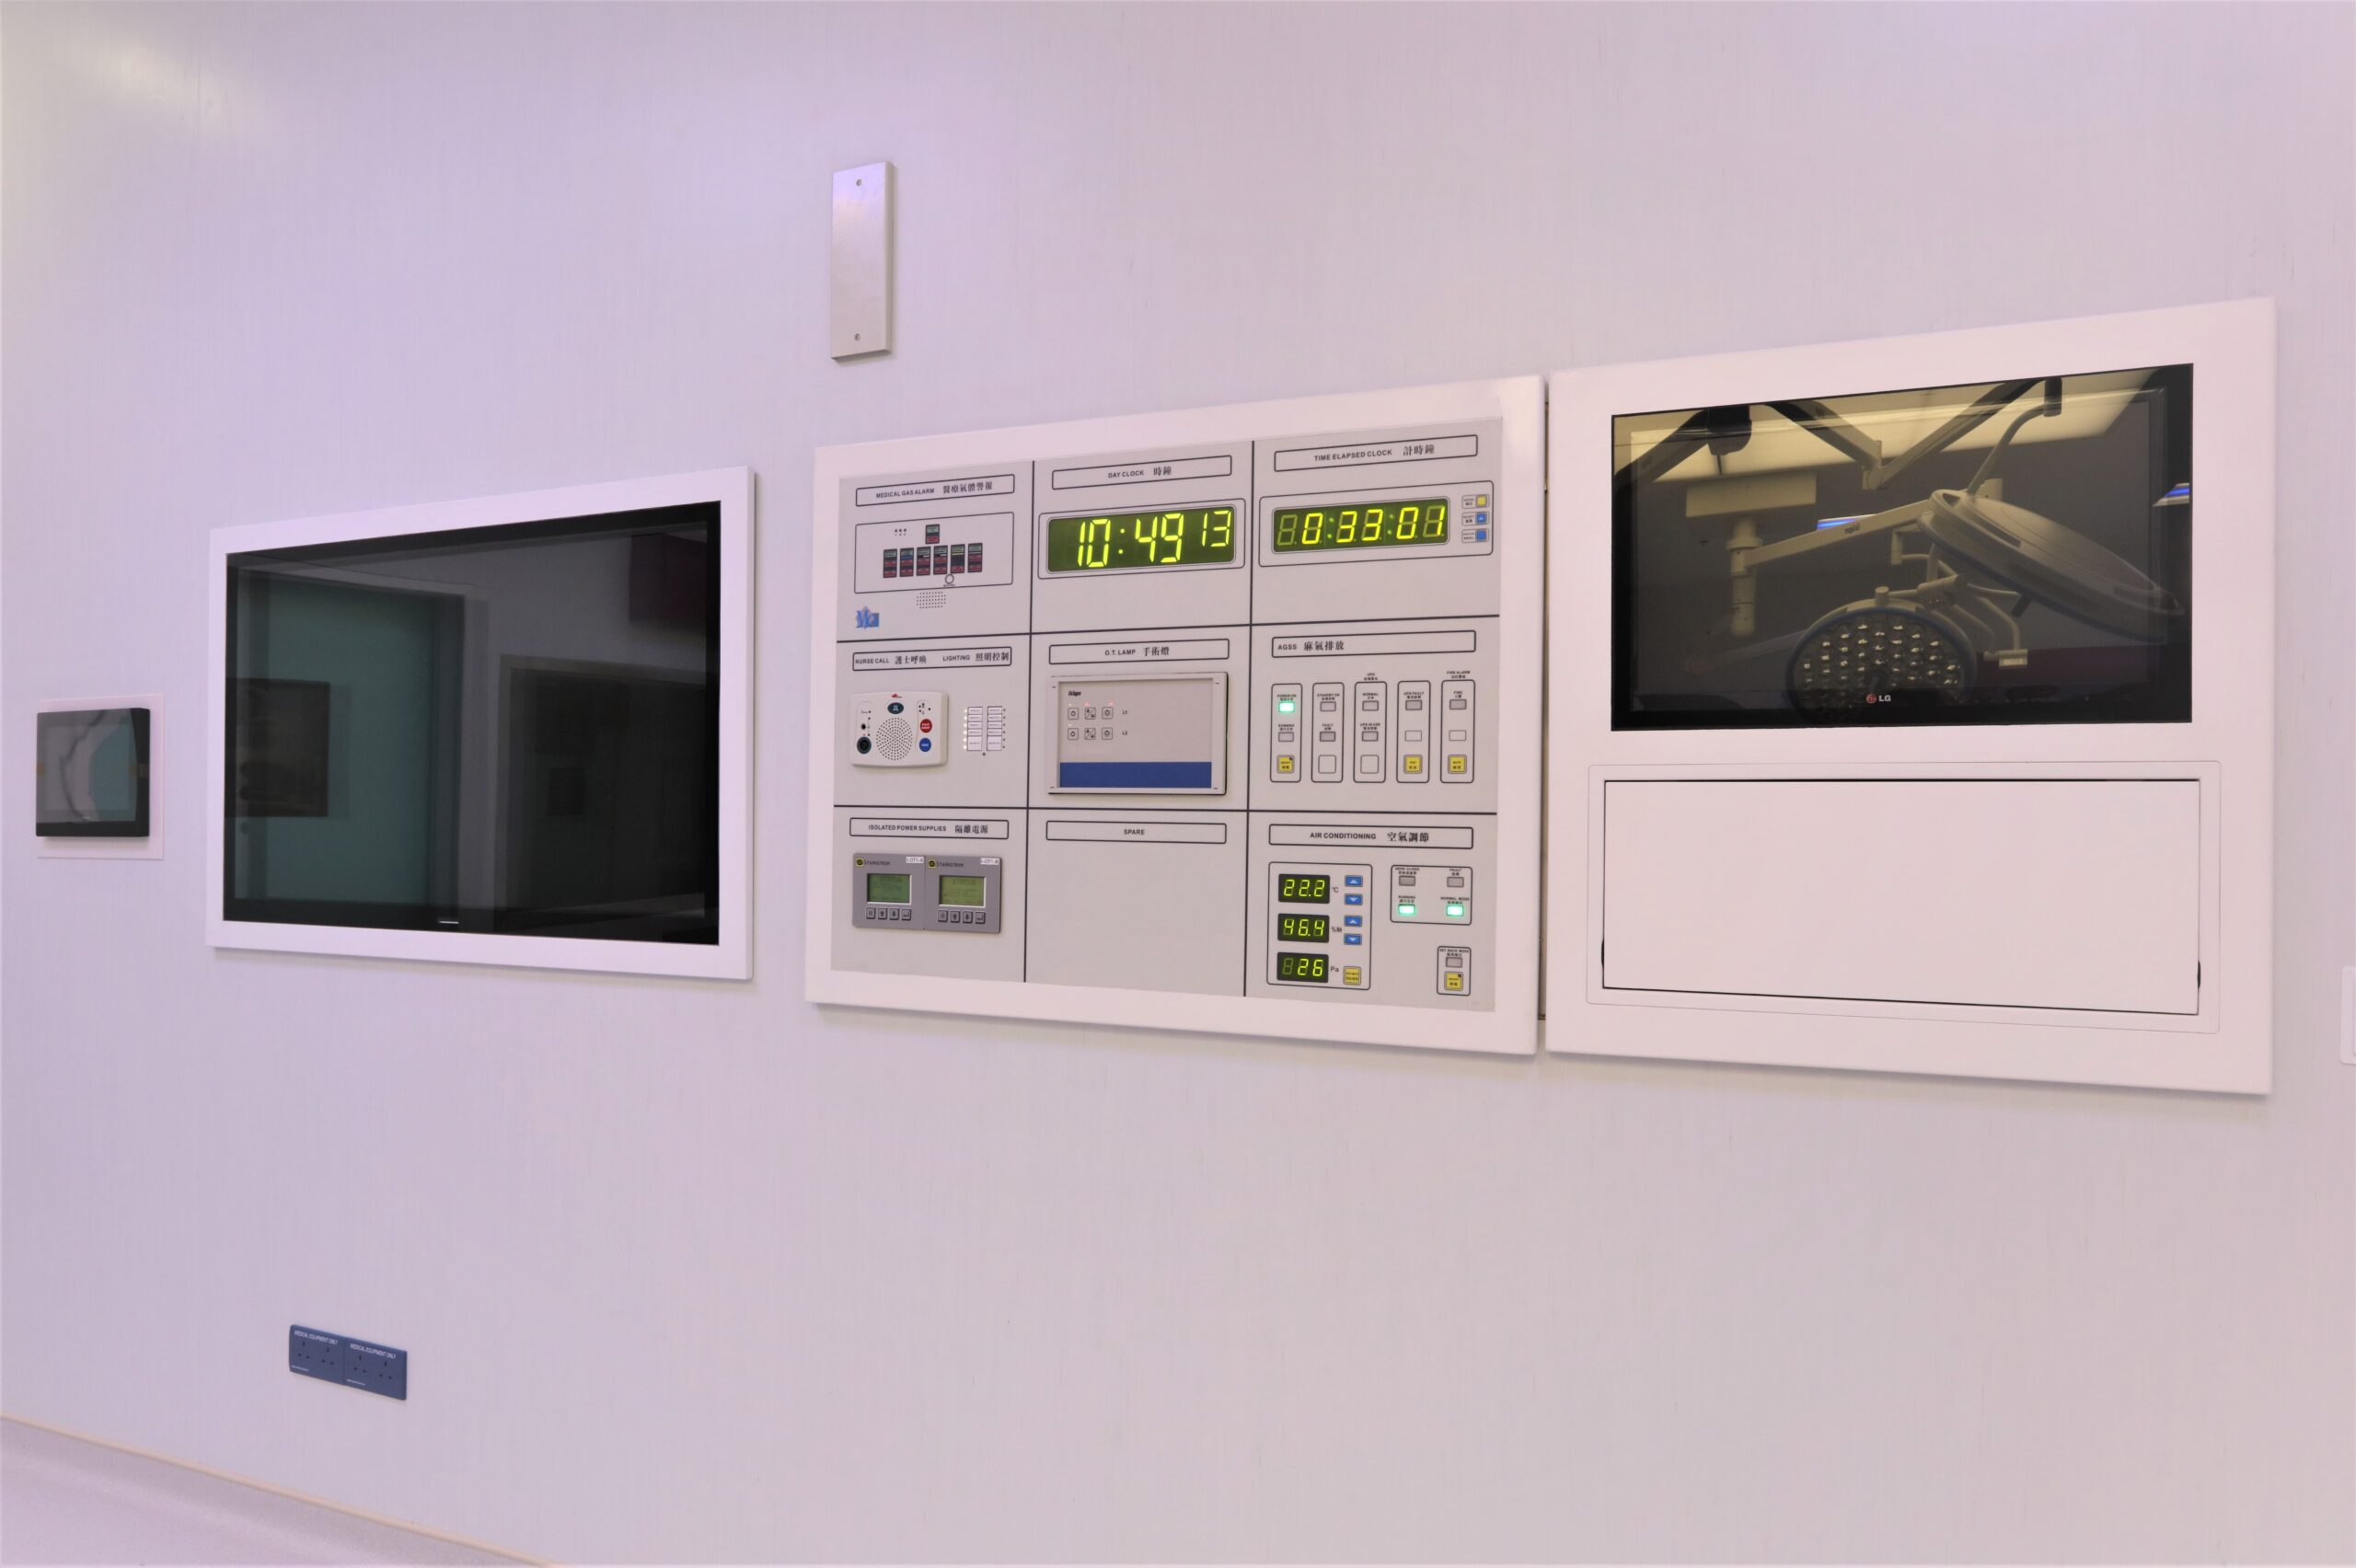 Control Panel (2)